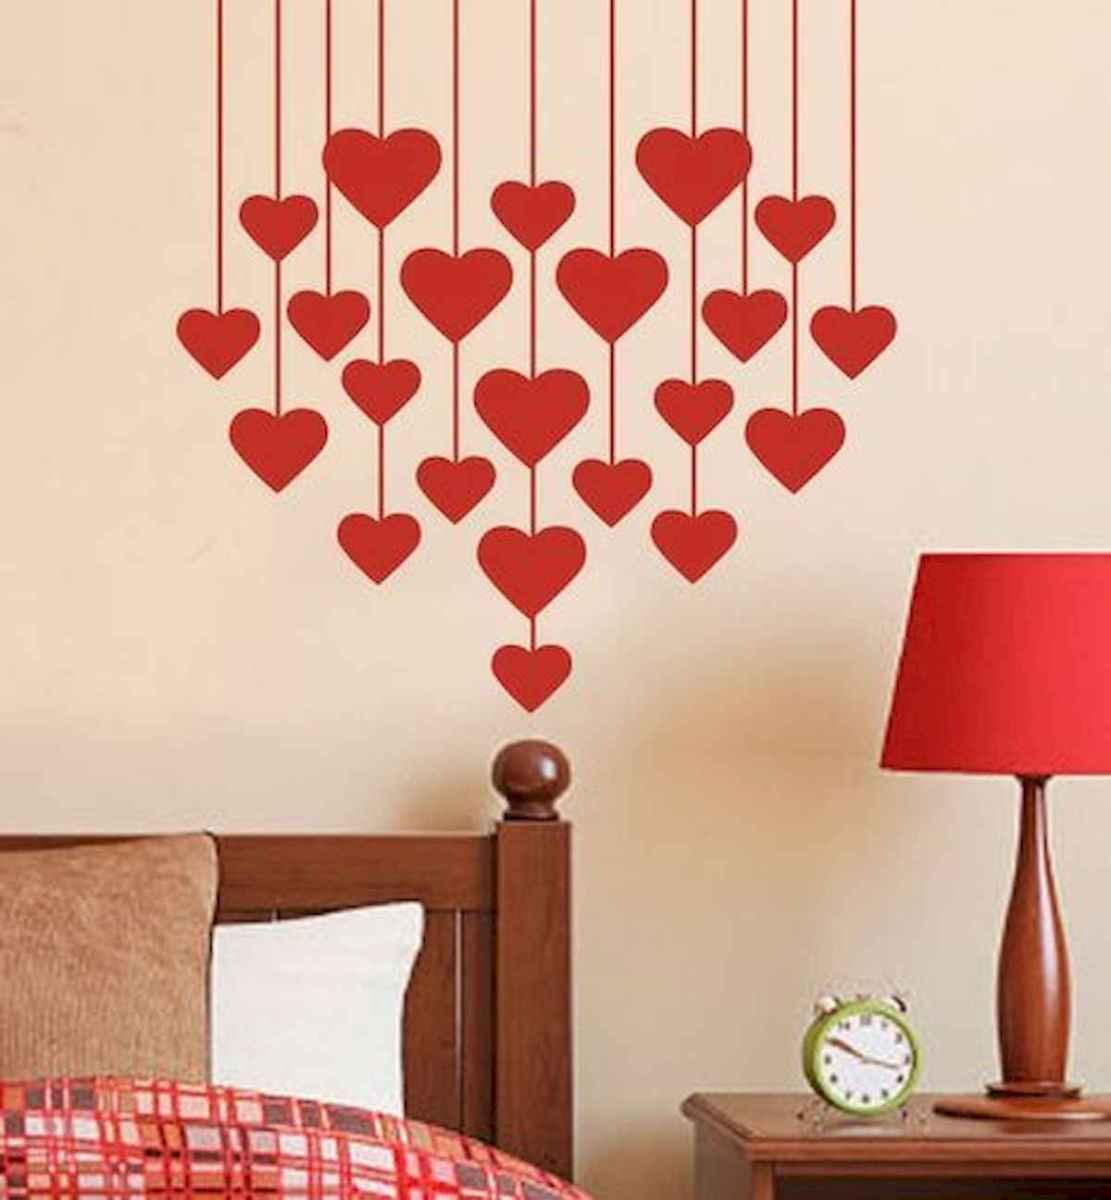 50 Romantic Valentines Day Decor Ideas (12)